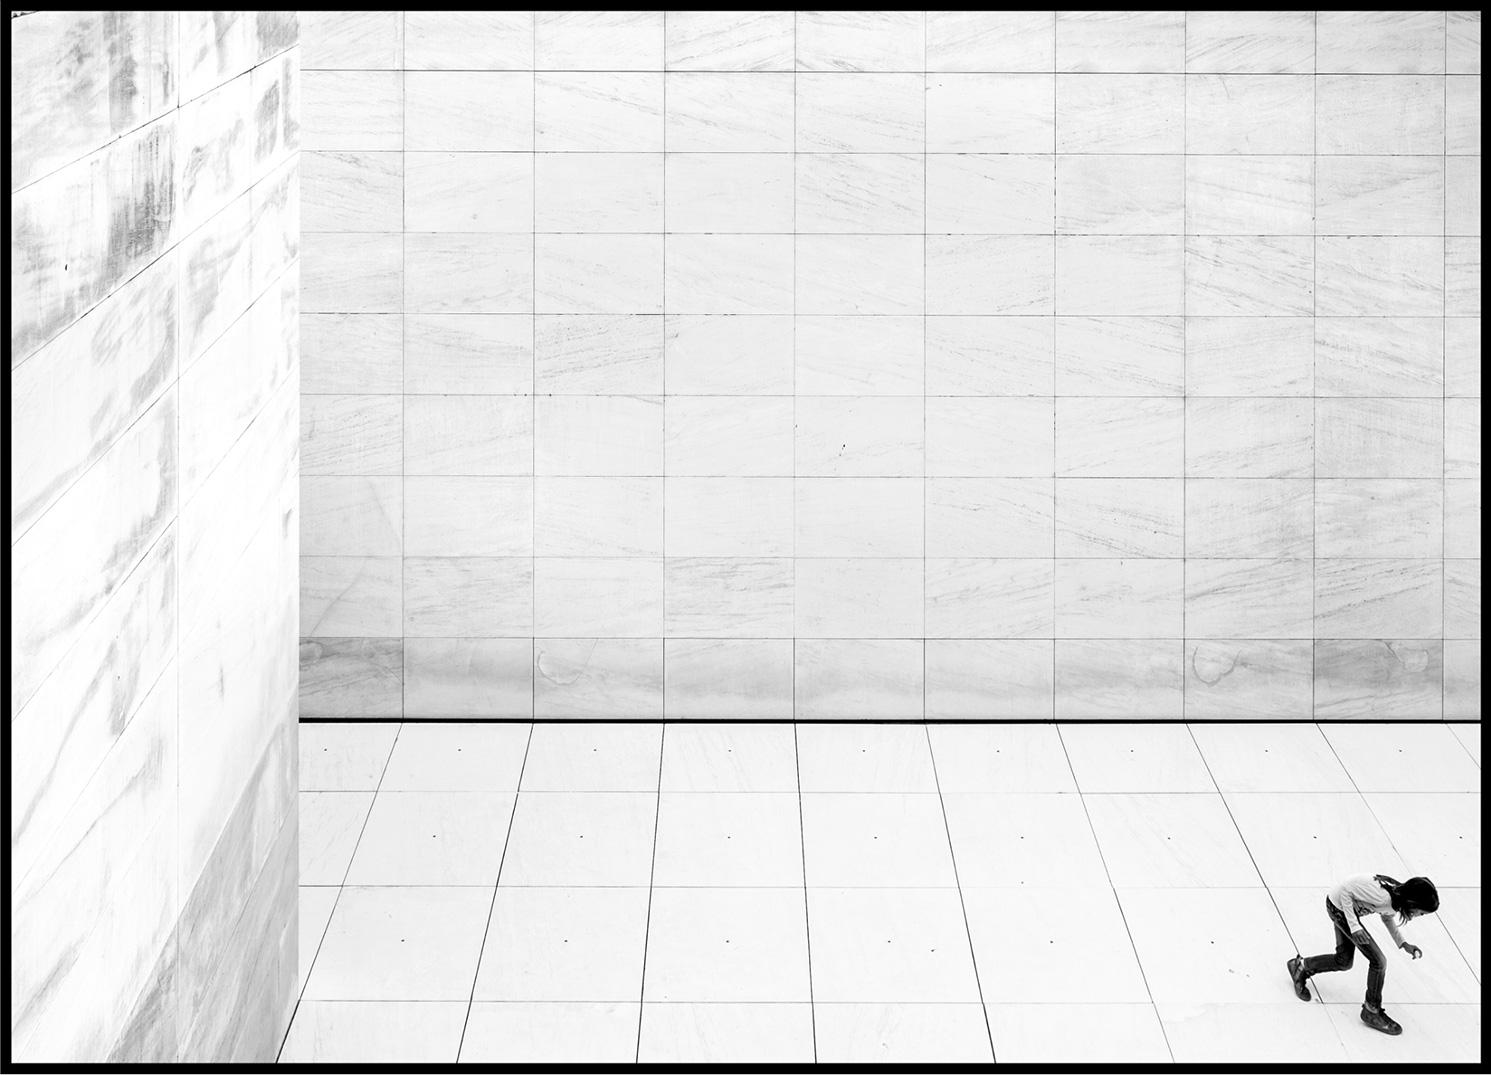 sergi-garcia-fujifilm-street-photographer-fujifeed-interview-18.jpg